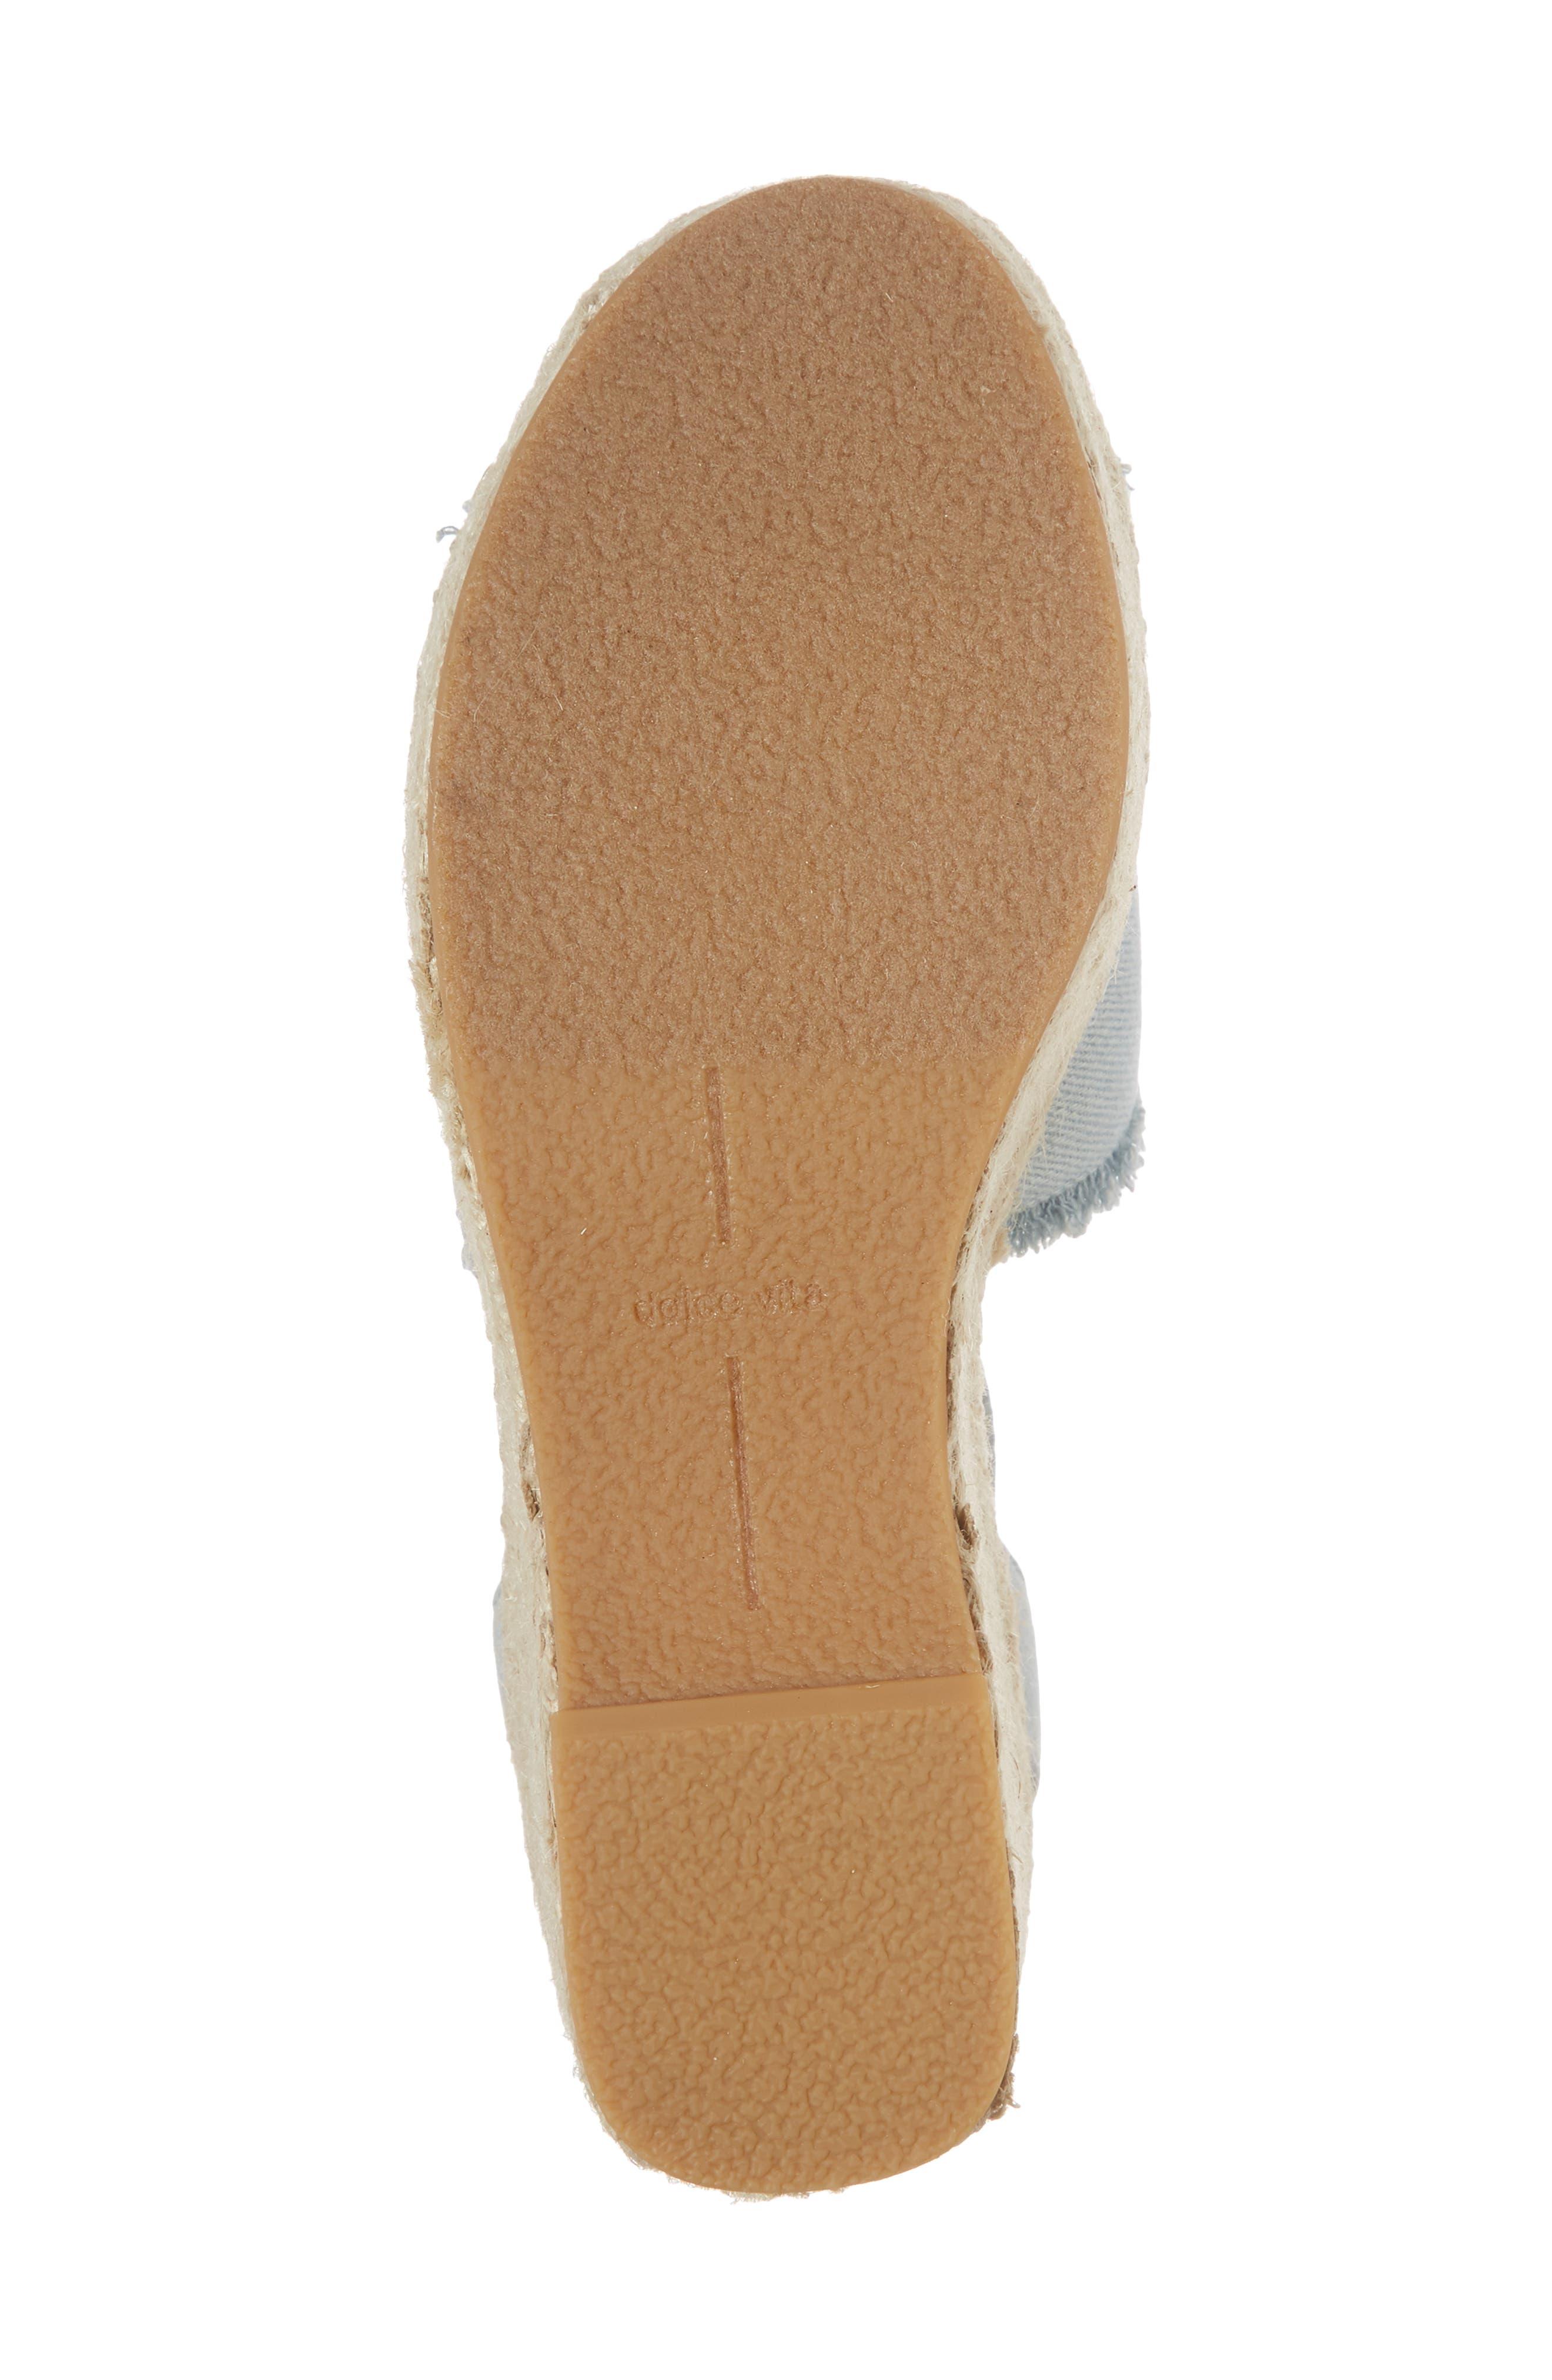 Lesly Espadrille Platform Sandal,                             Alternate thumbnail 39, color,